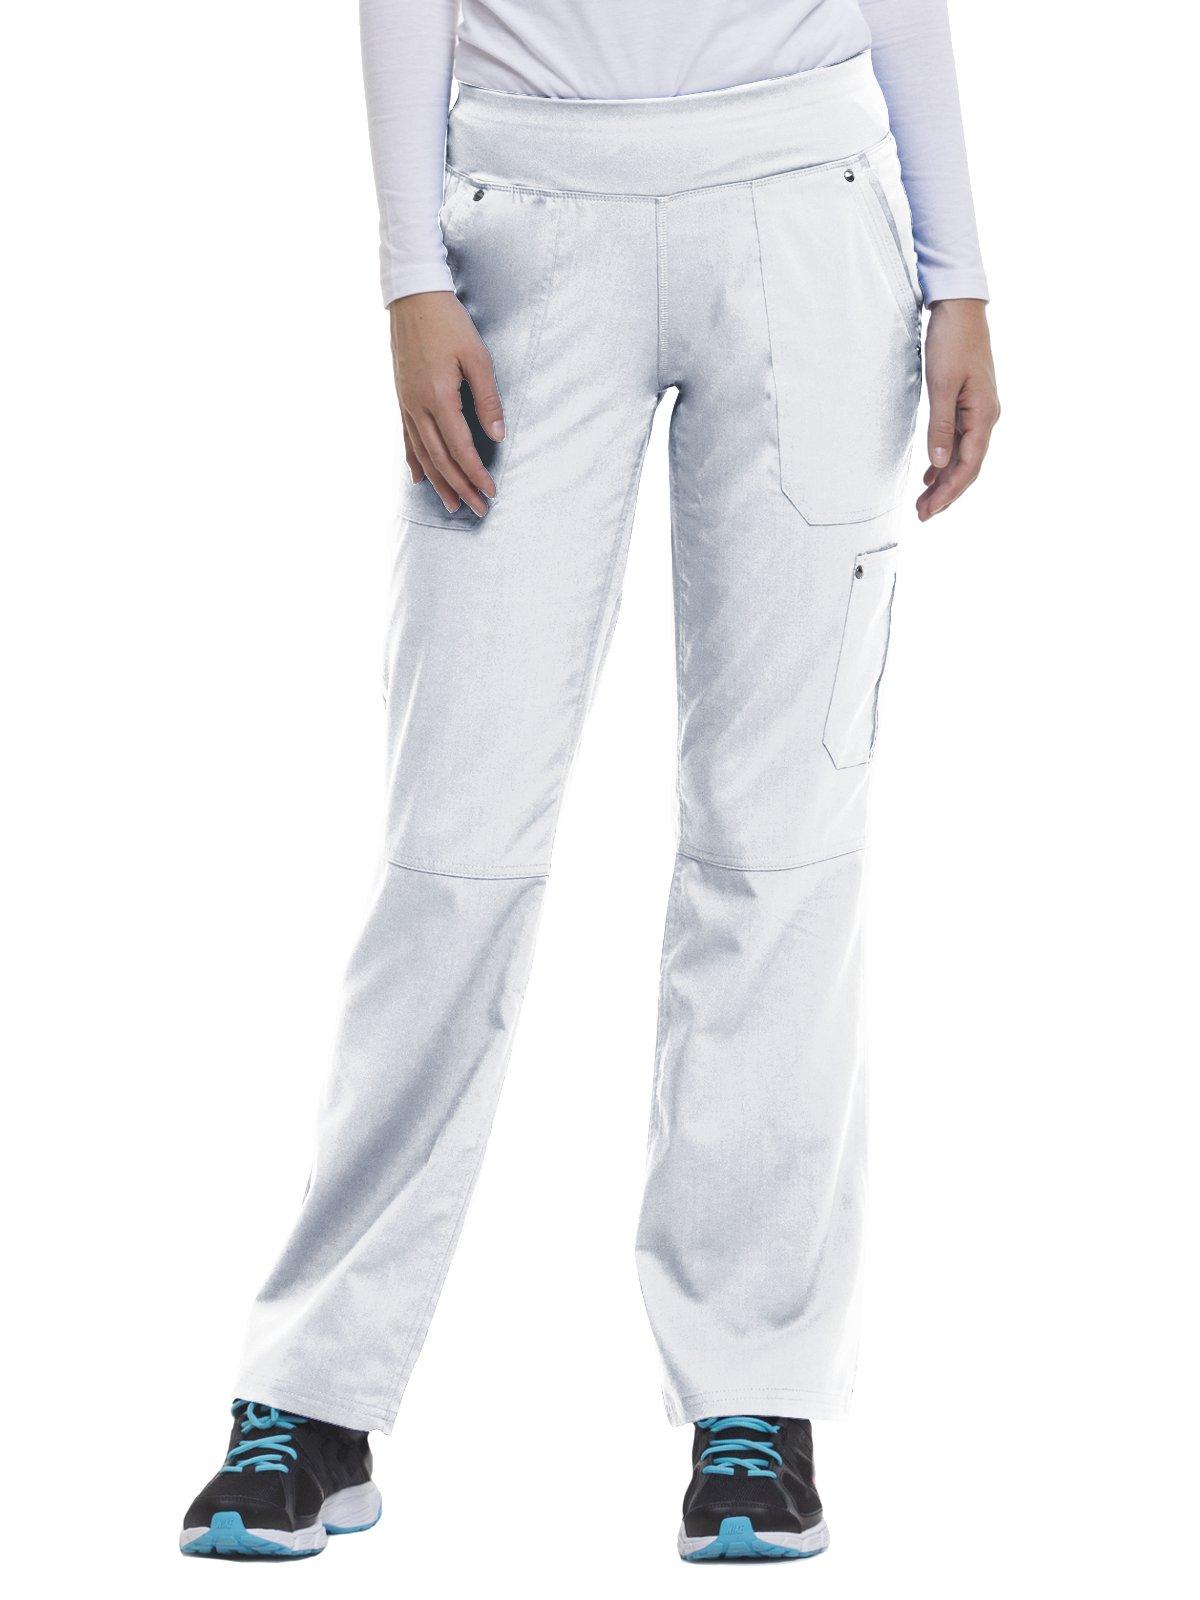 Purple Label by Healing Hands Scrubs Women's Tori 9133 5 Pocket Knit Waist Pant White- 4X-Large